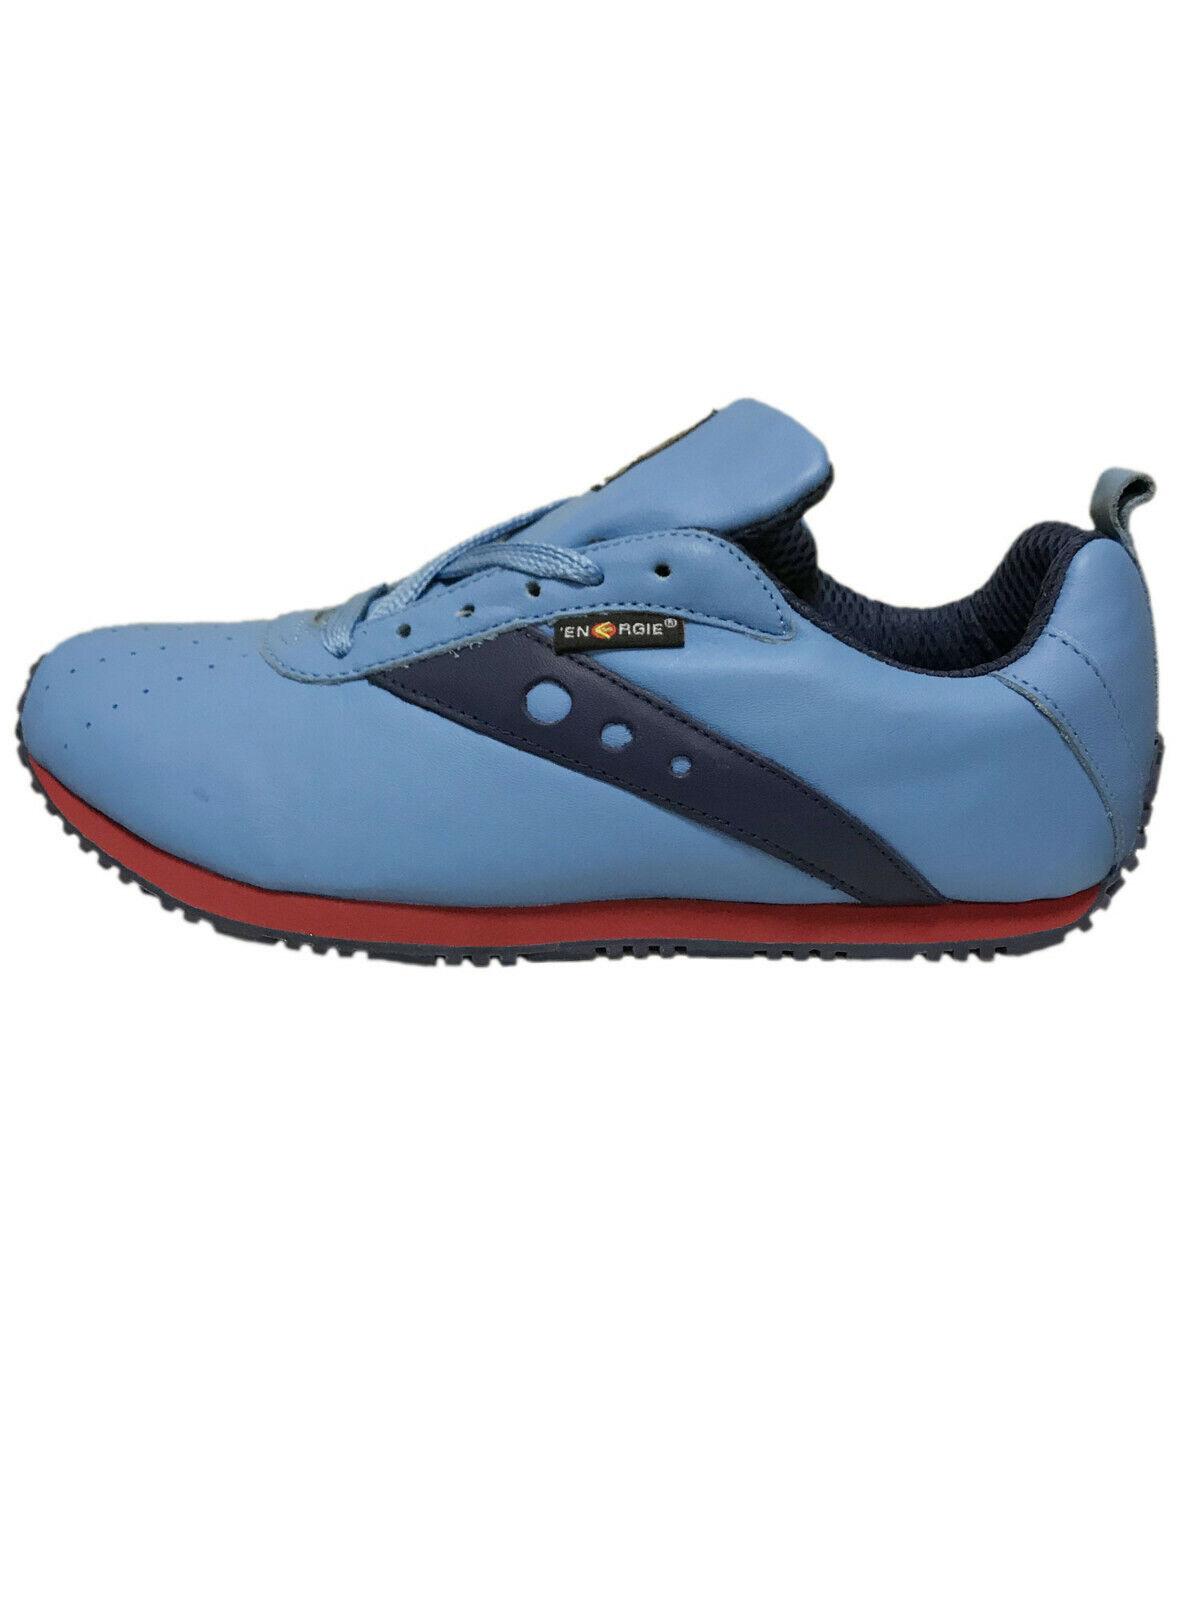 Energie Vintage Vintage Vintage Leather scarpe da ginnastica | Ottimo mestiere  | Uomo/Donna Scarpa  8ad8cc